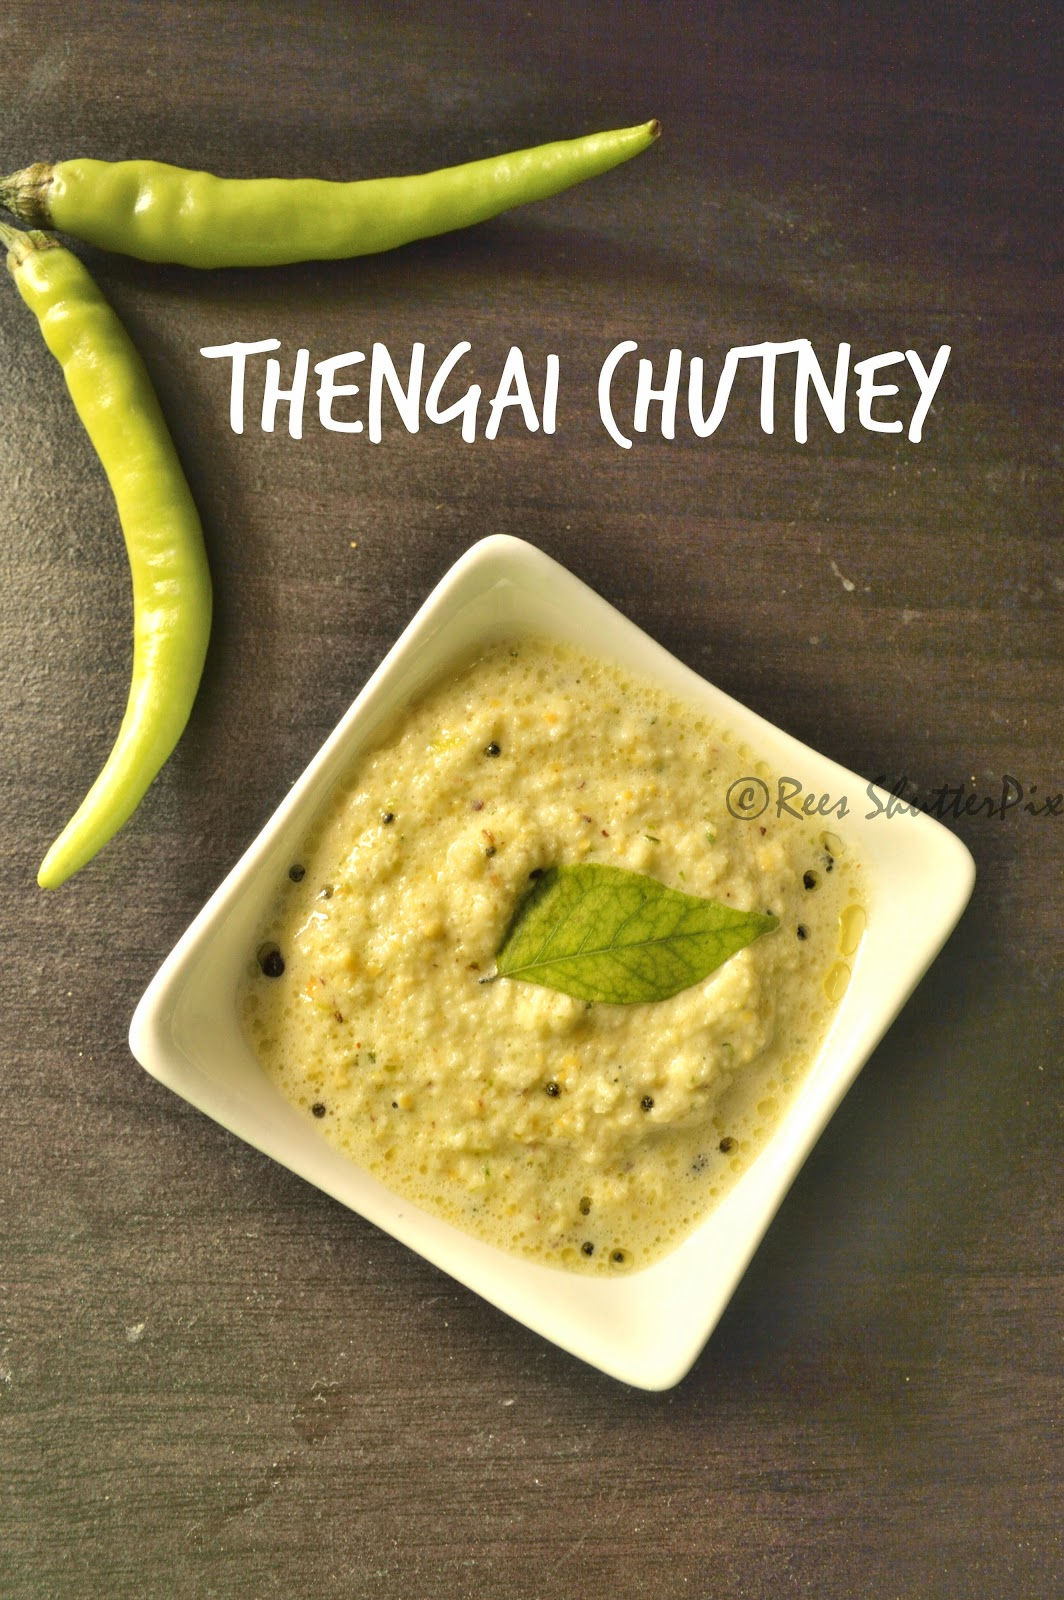 coconut chutney recipe, thengai chutney recipe, easy chutney recipe